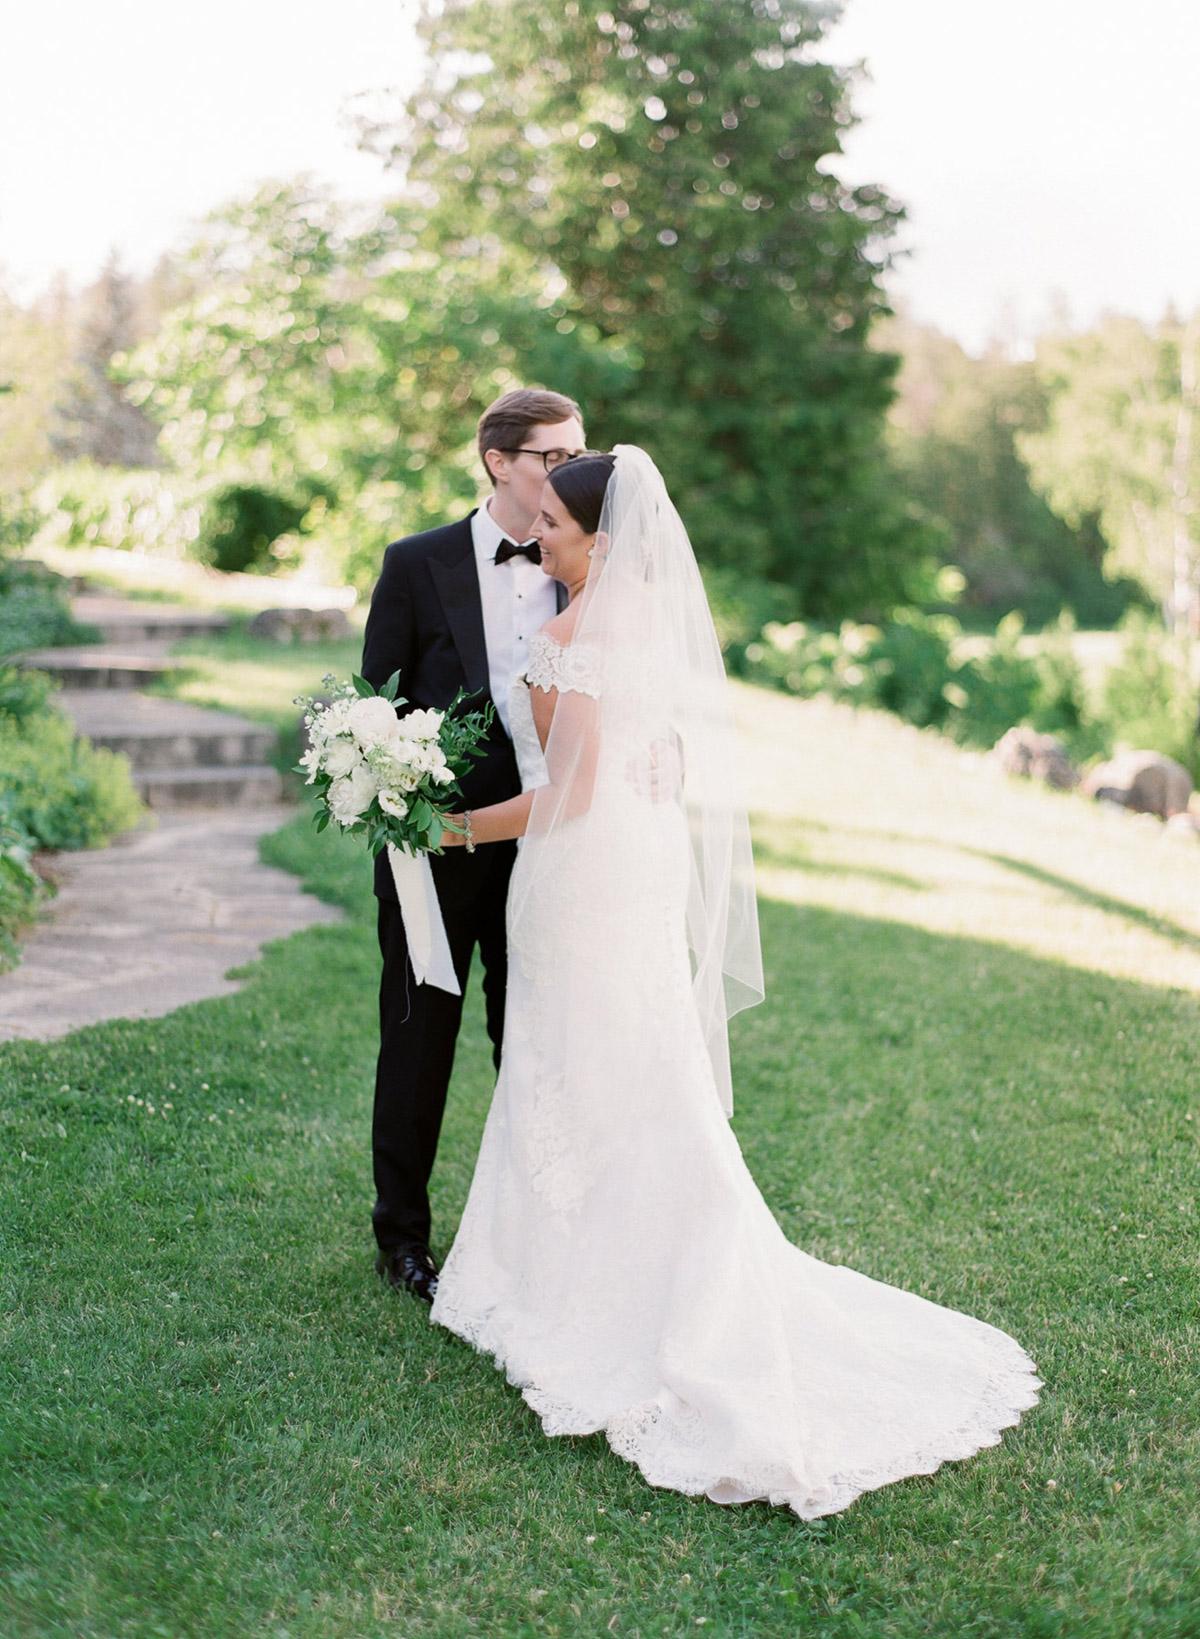 artiese-studios-vineyard-bride-swish-list-private-estate-cambridge-wedding-27.jpg